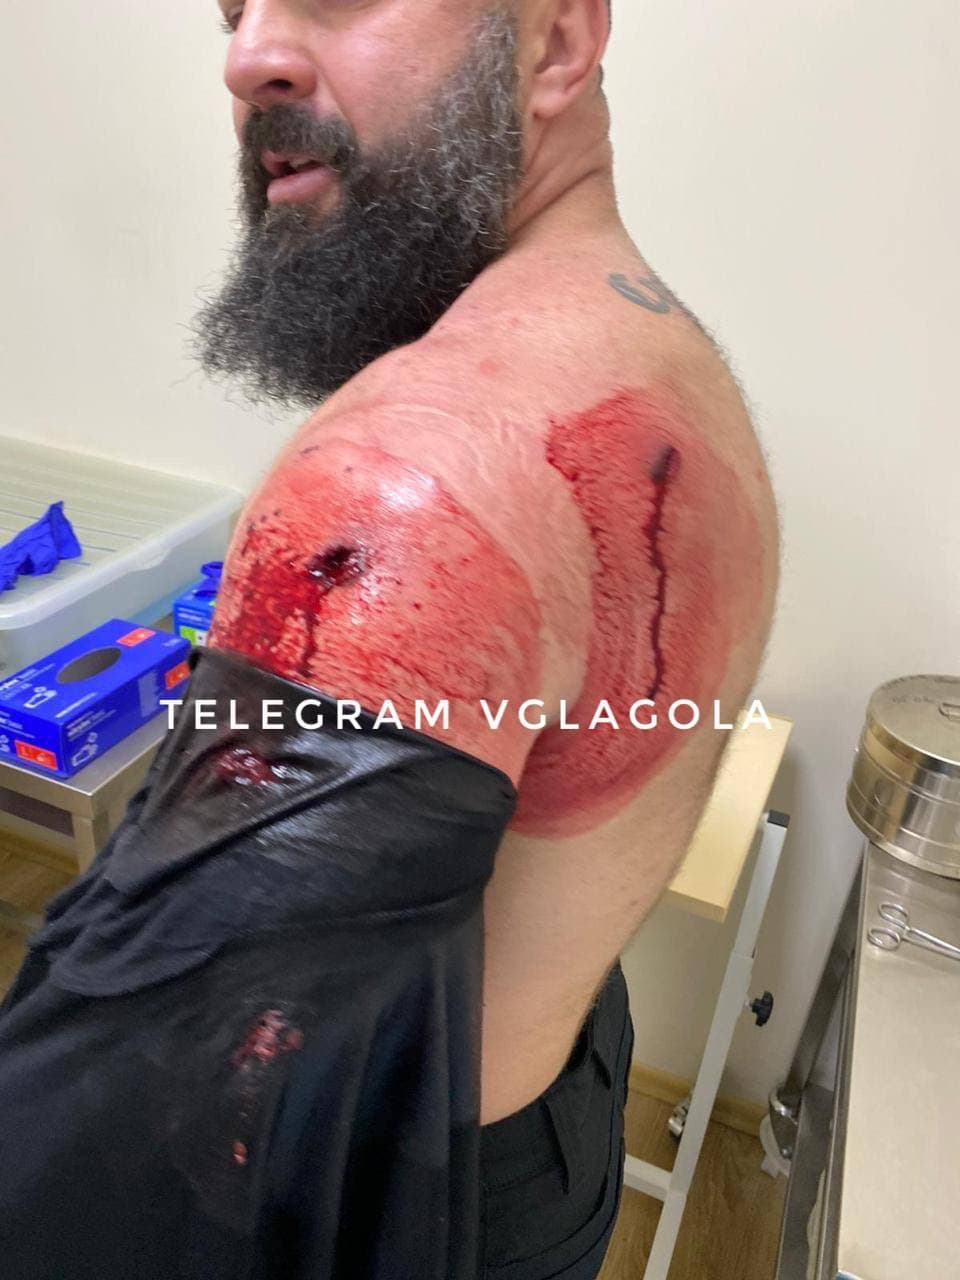 Подозреваемых в нападении на «авторитета» в Мукачево суд признал невиновными (ФОТО)